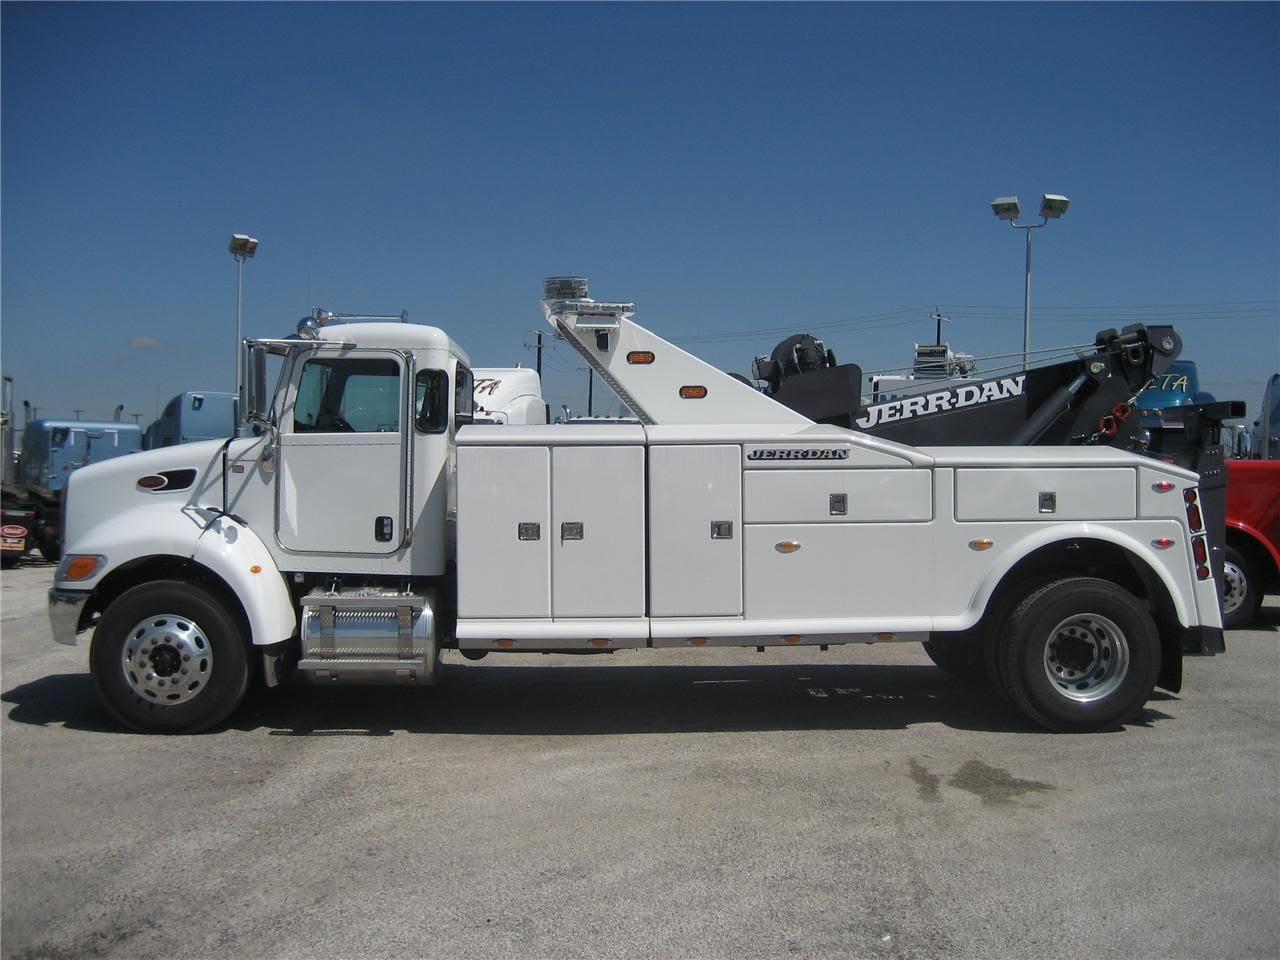 Arm Lift San Antonio >> Bigtruckbrad's World of Work Trucks: Brand new 2013 Peterbilt 337 with Jerr Dan 25 Ton wrecker SOLD